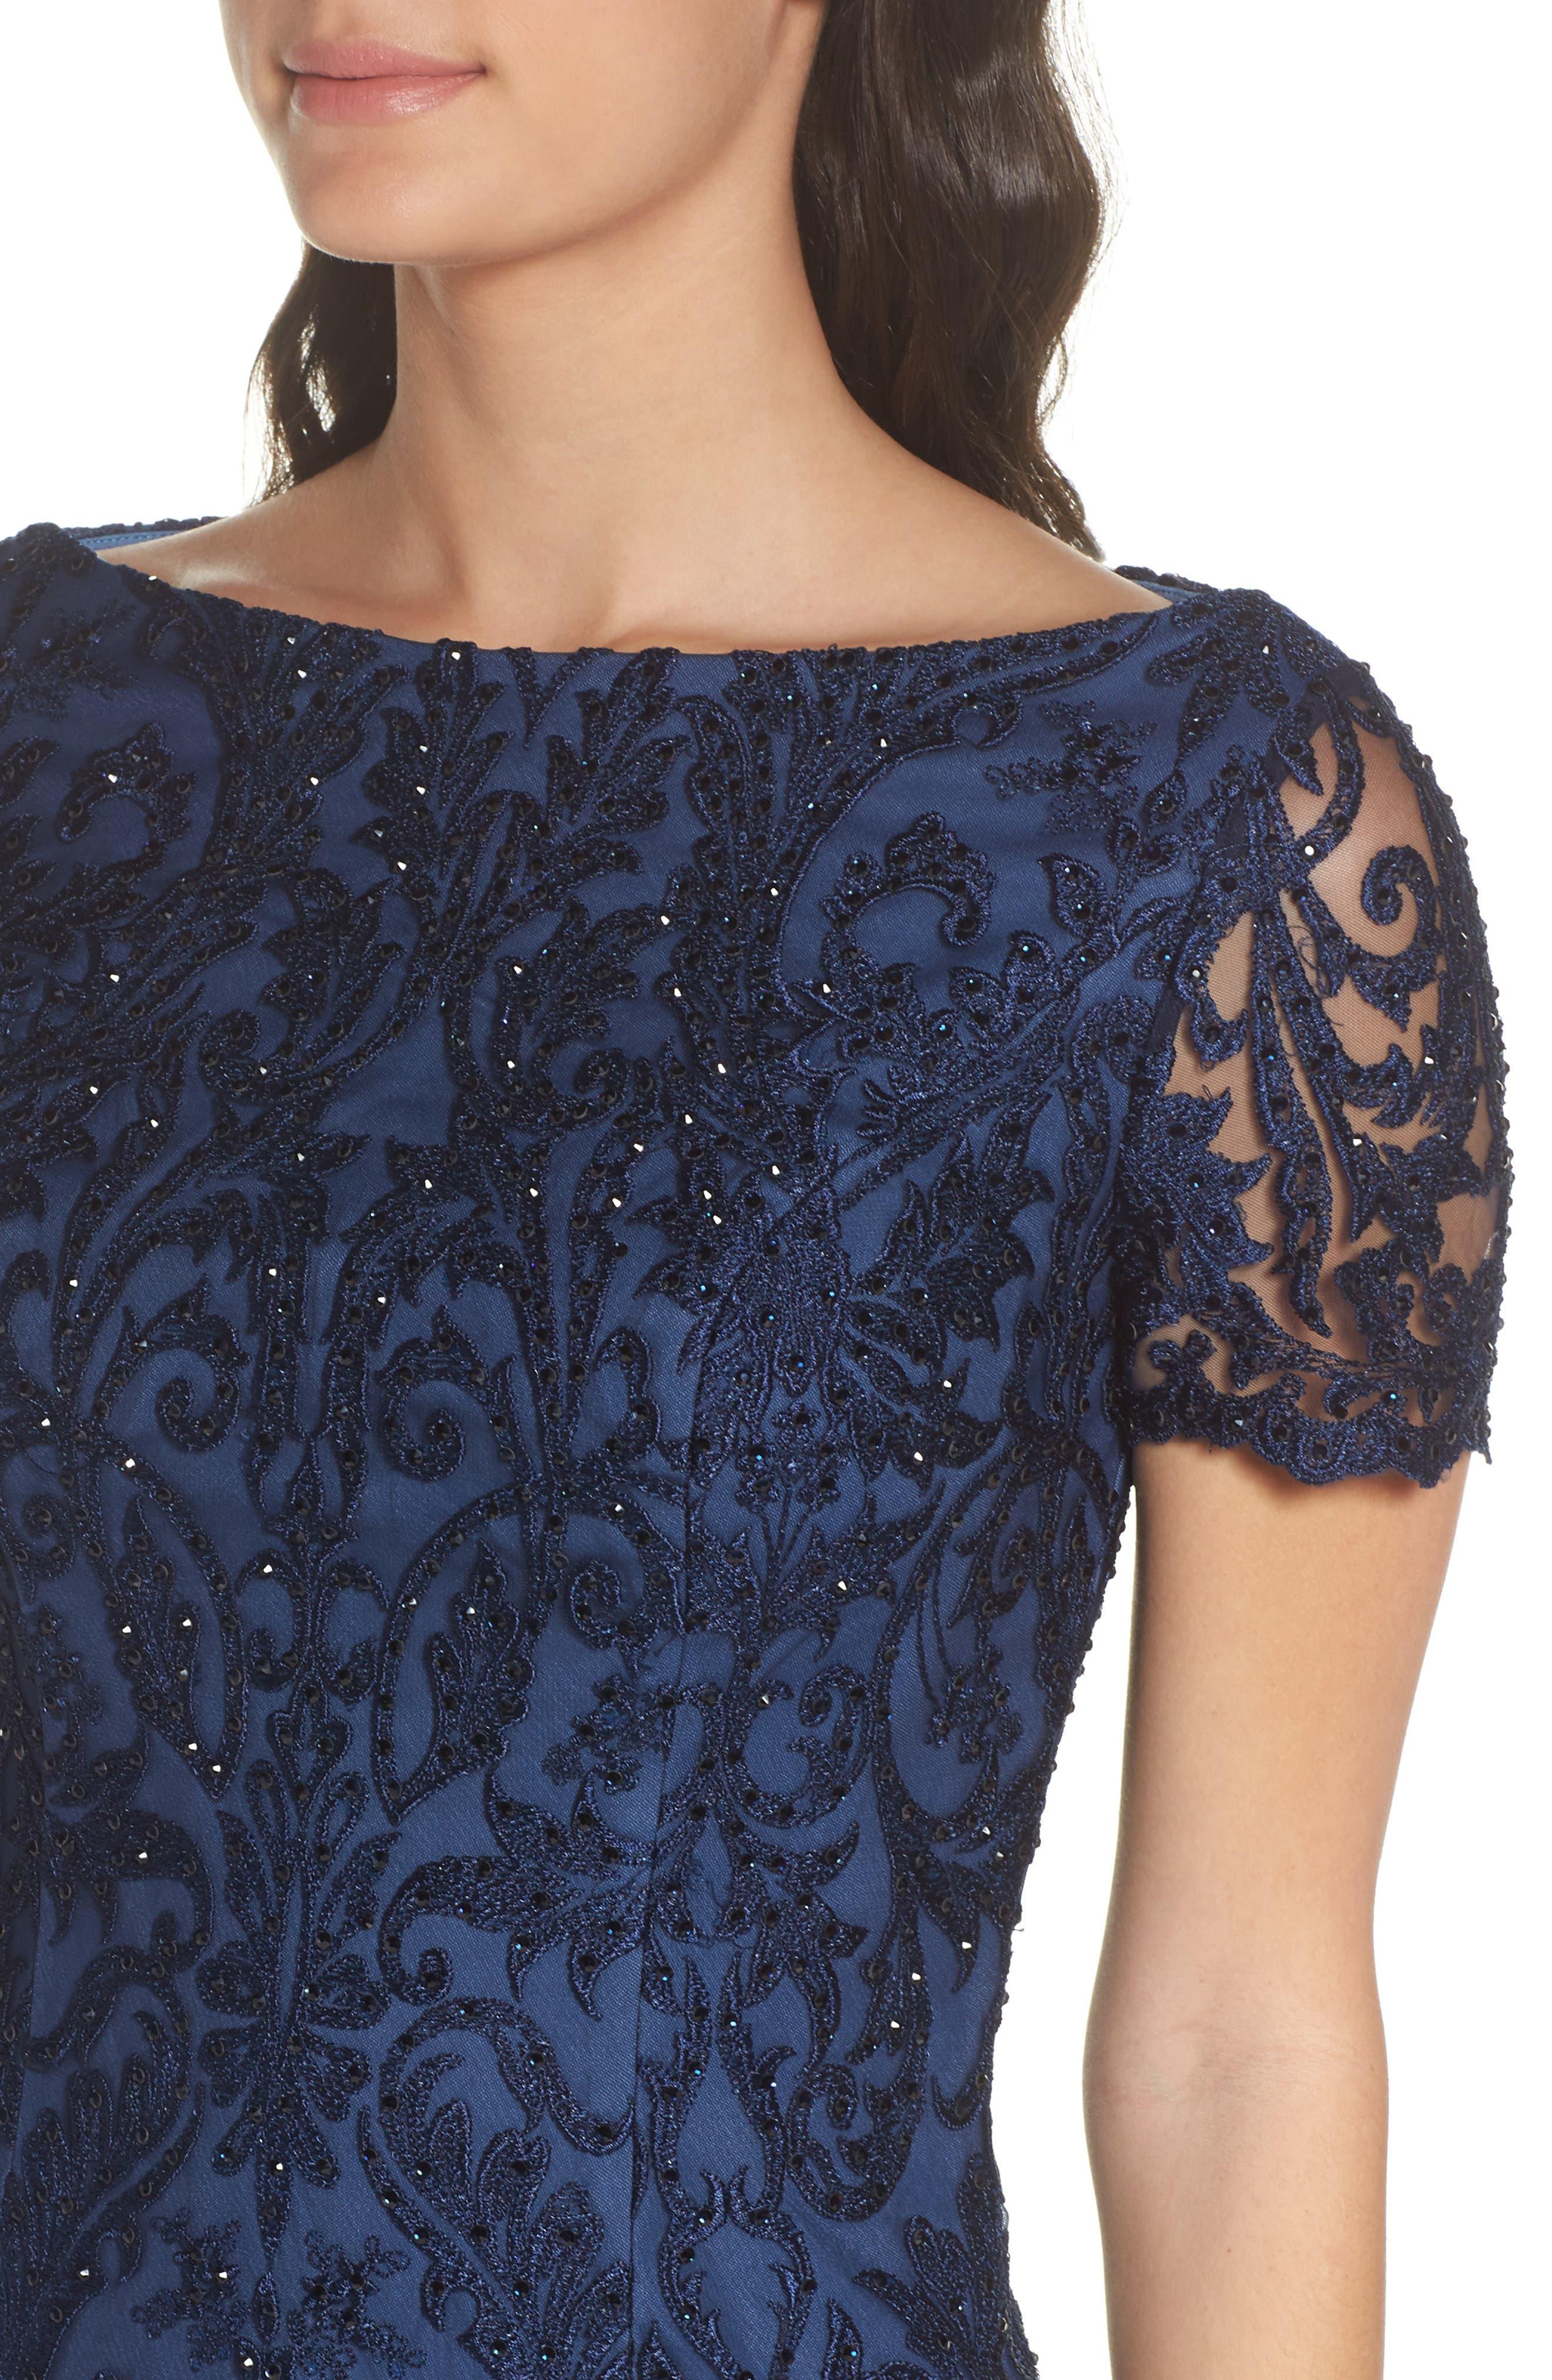 LA FEMME, Beaded Lace Sheath Dress, Alternate thumbnail 4, color, SLATE BLUE